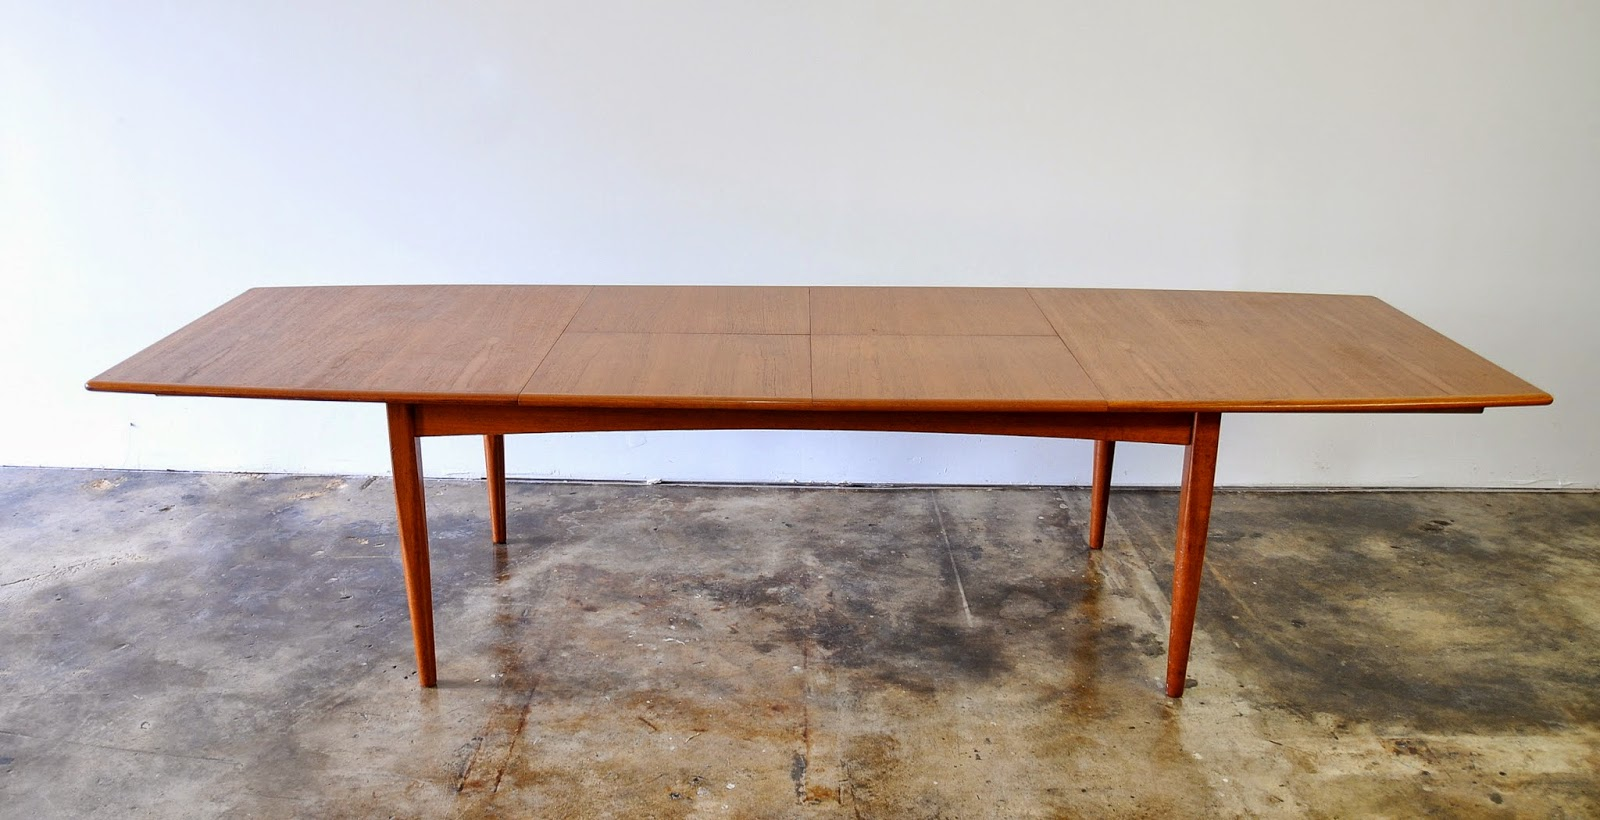 SELECT MODERN Falster Teak Expandable Dining Table : DanishModernFalsterTeakDiningTable2 from midcenturymoderndesignfinds.blogspot.com size 1600 x 820 jpeg 218kB